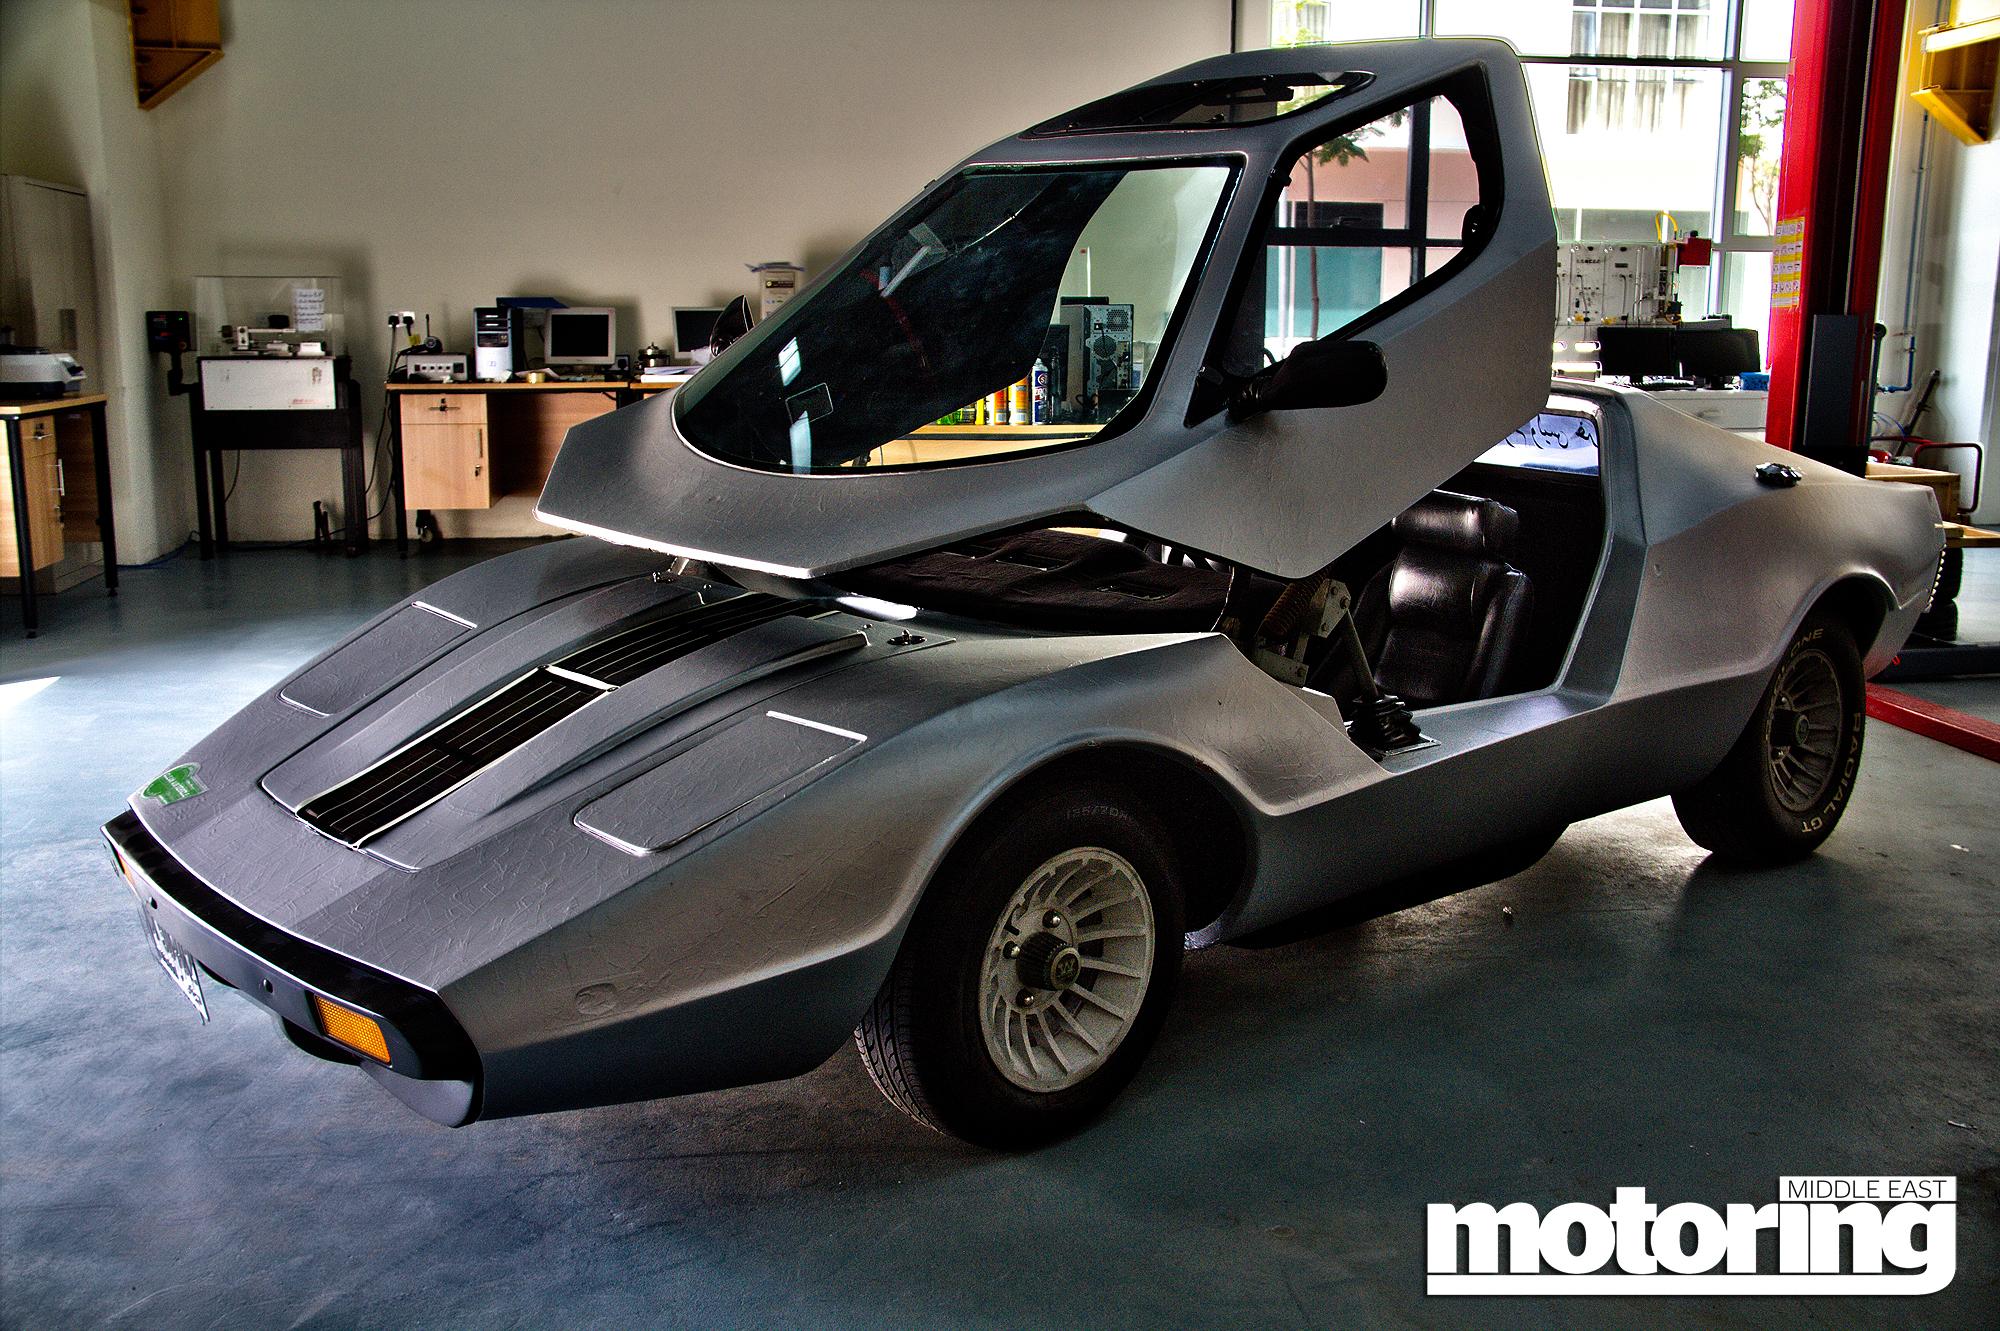 UAE-built EV - electric car in DubaiMotoring Middle East ...